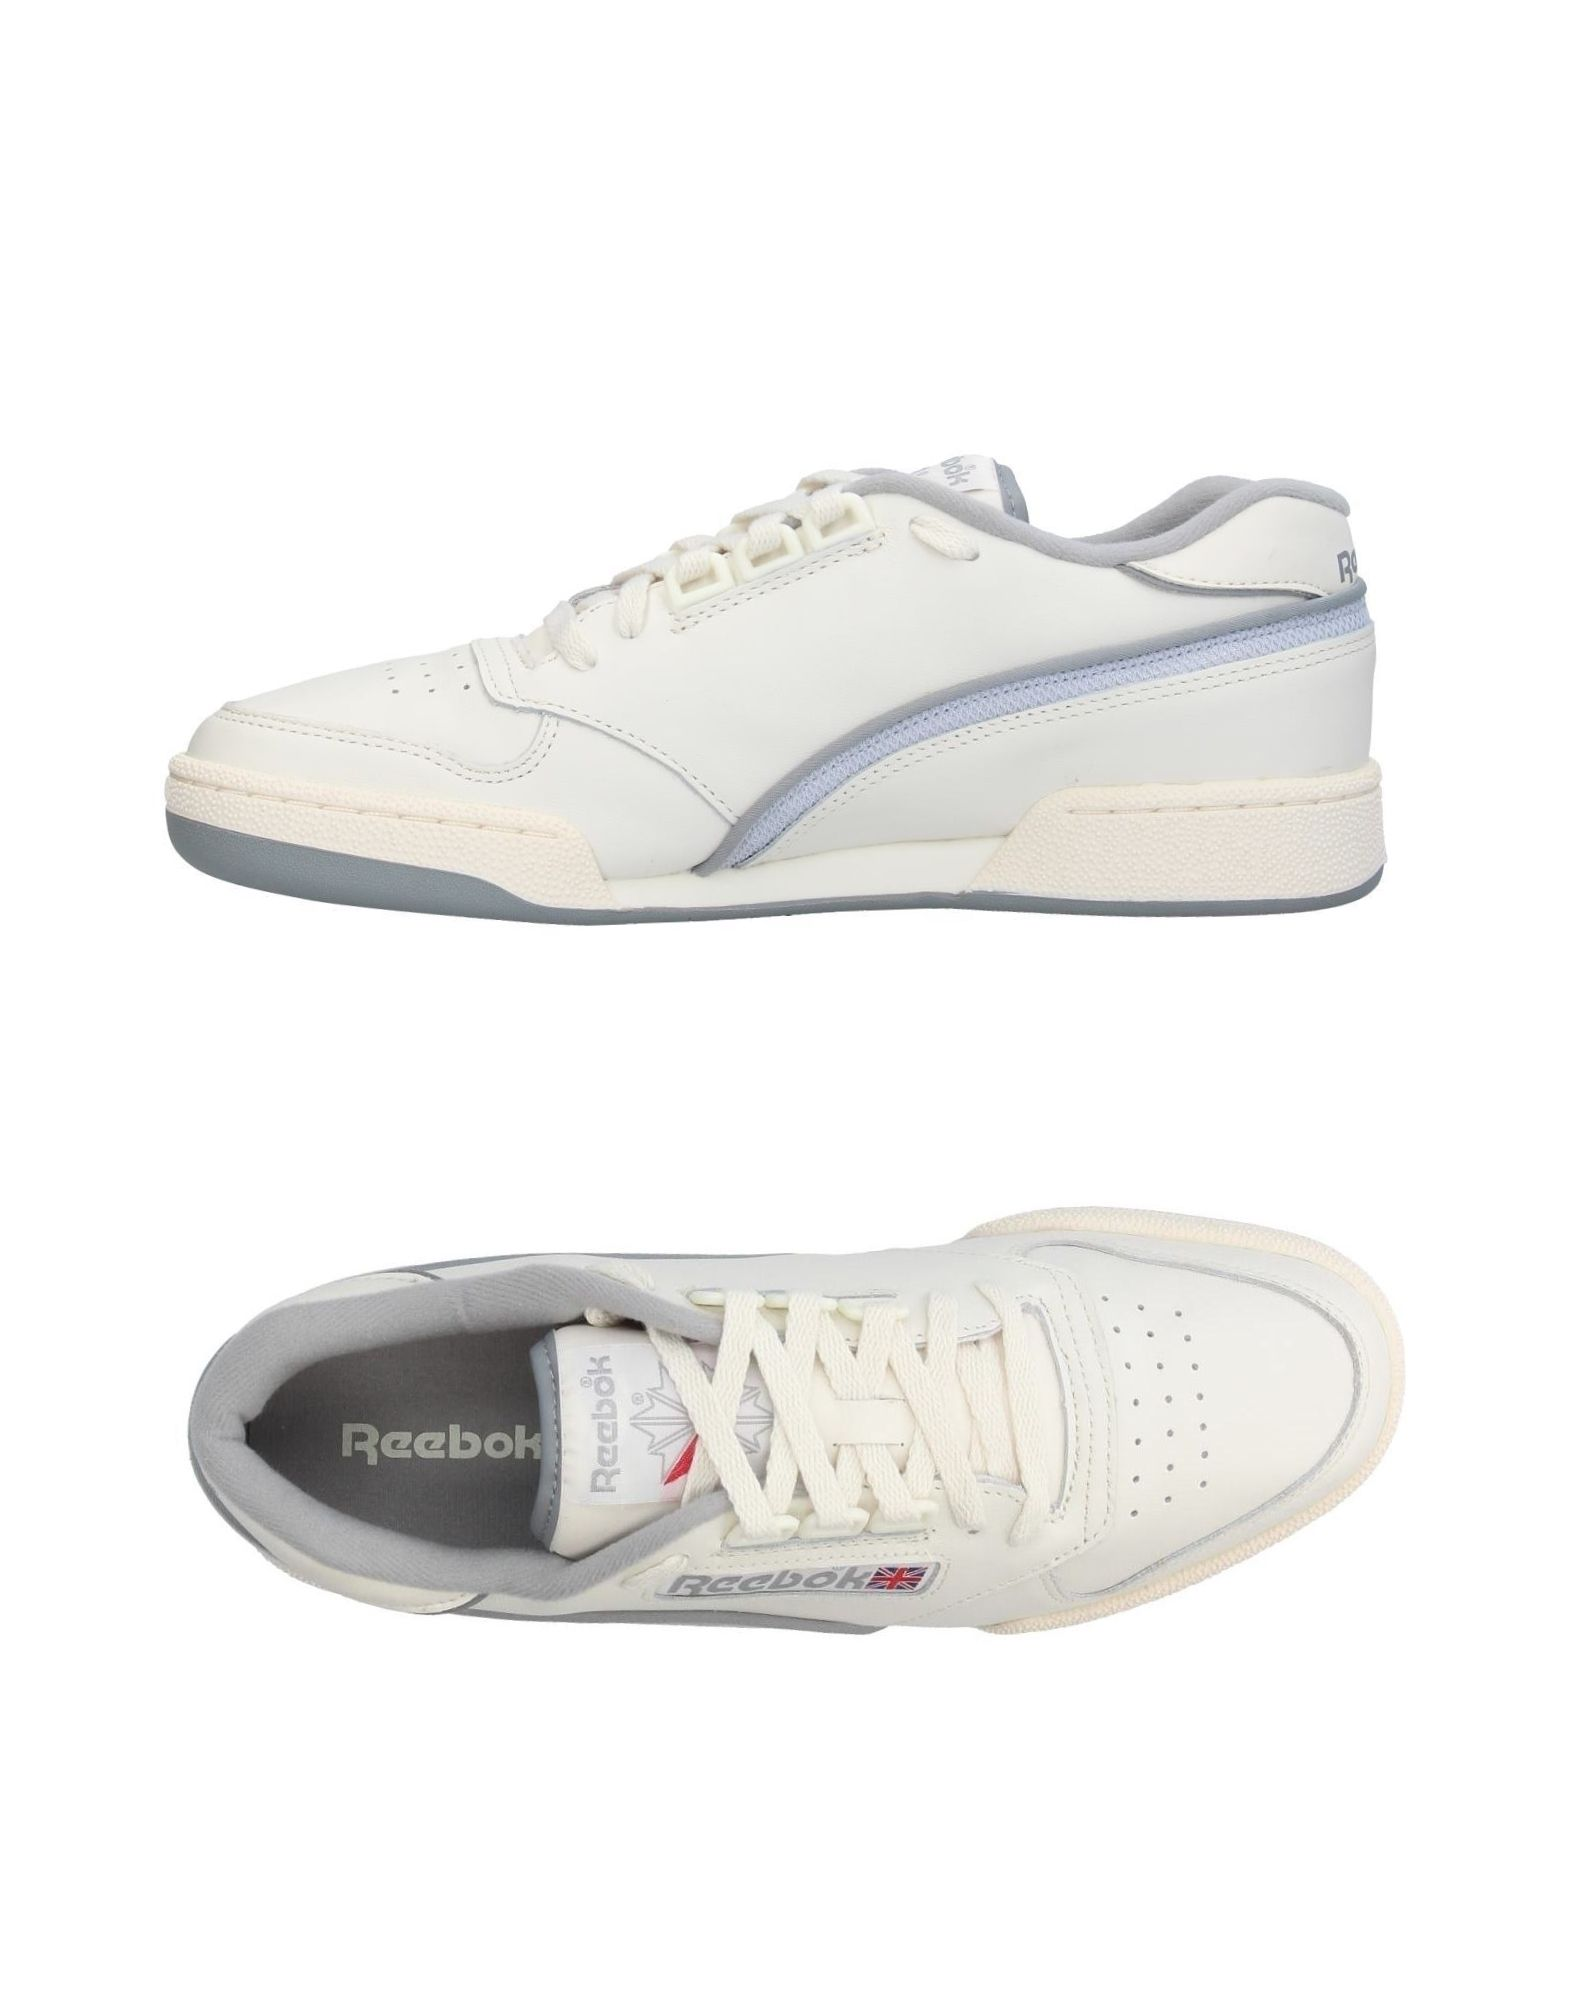 Moda Sneakers Reebok Uomo - 11409739RM